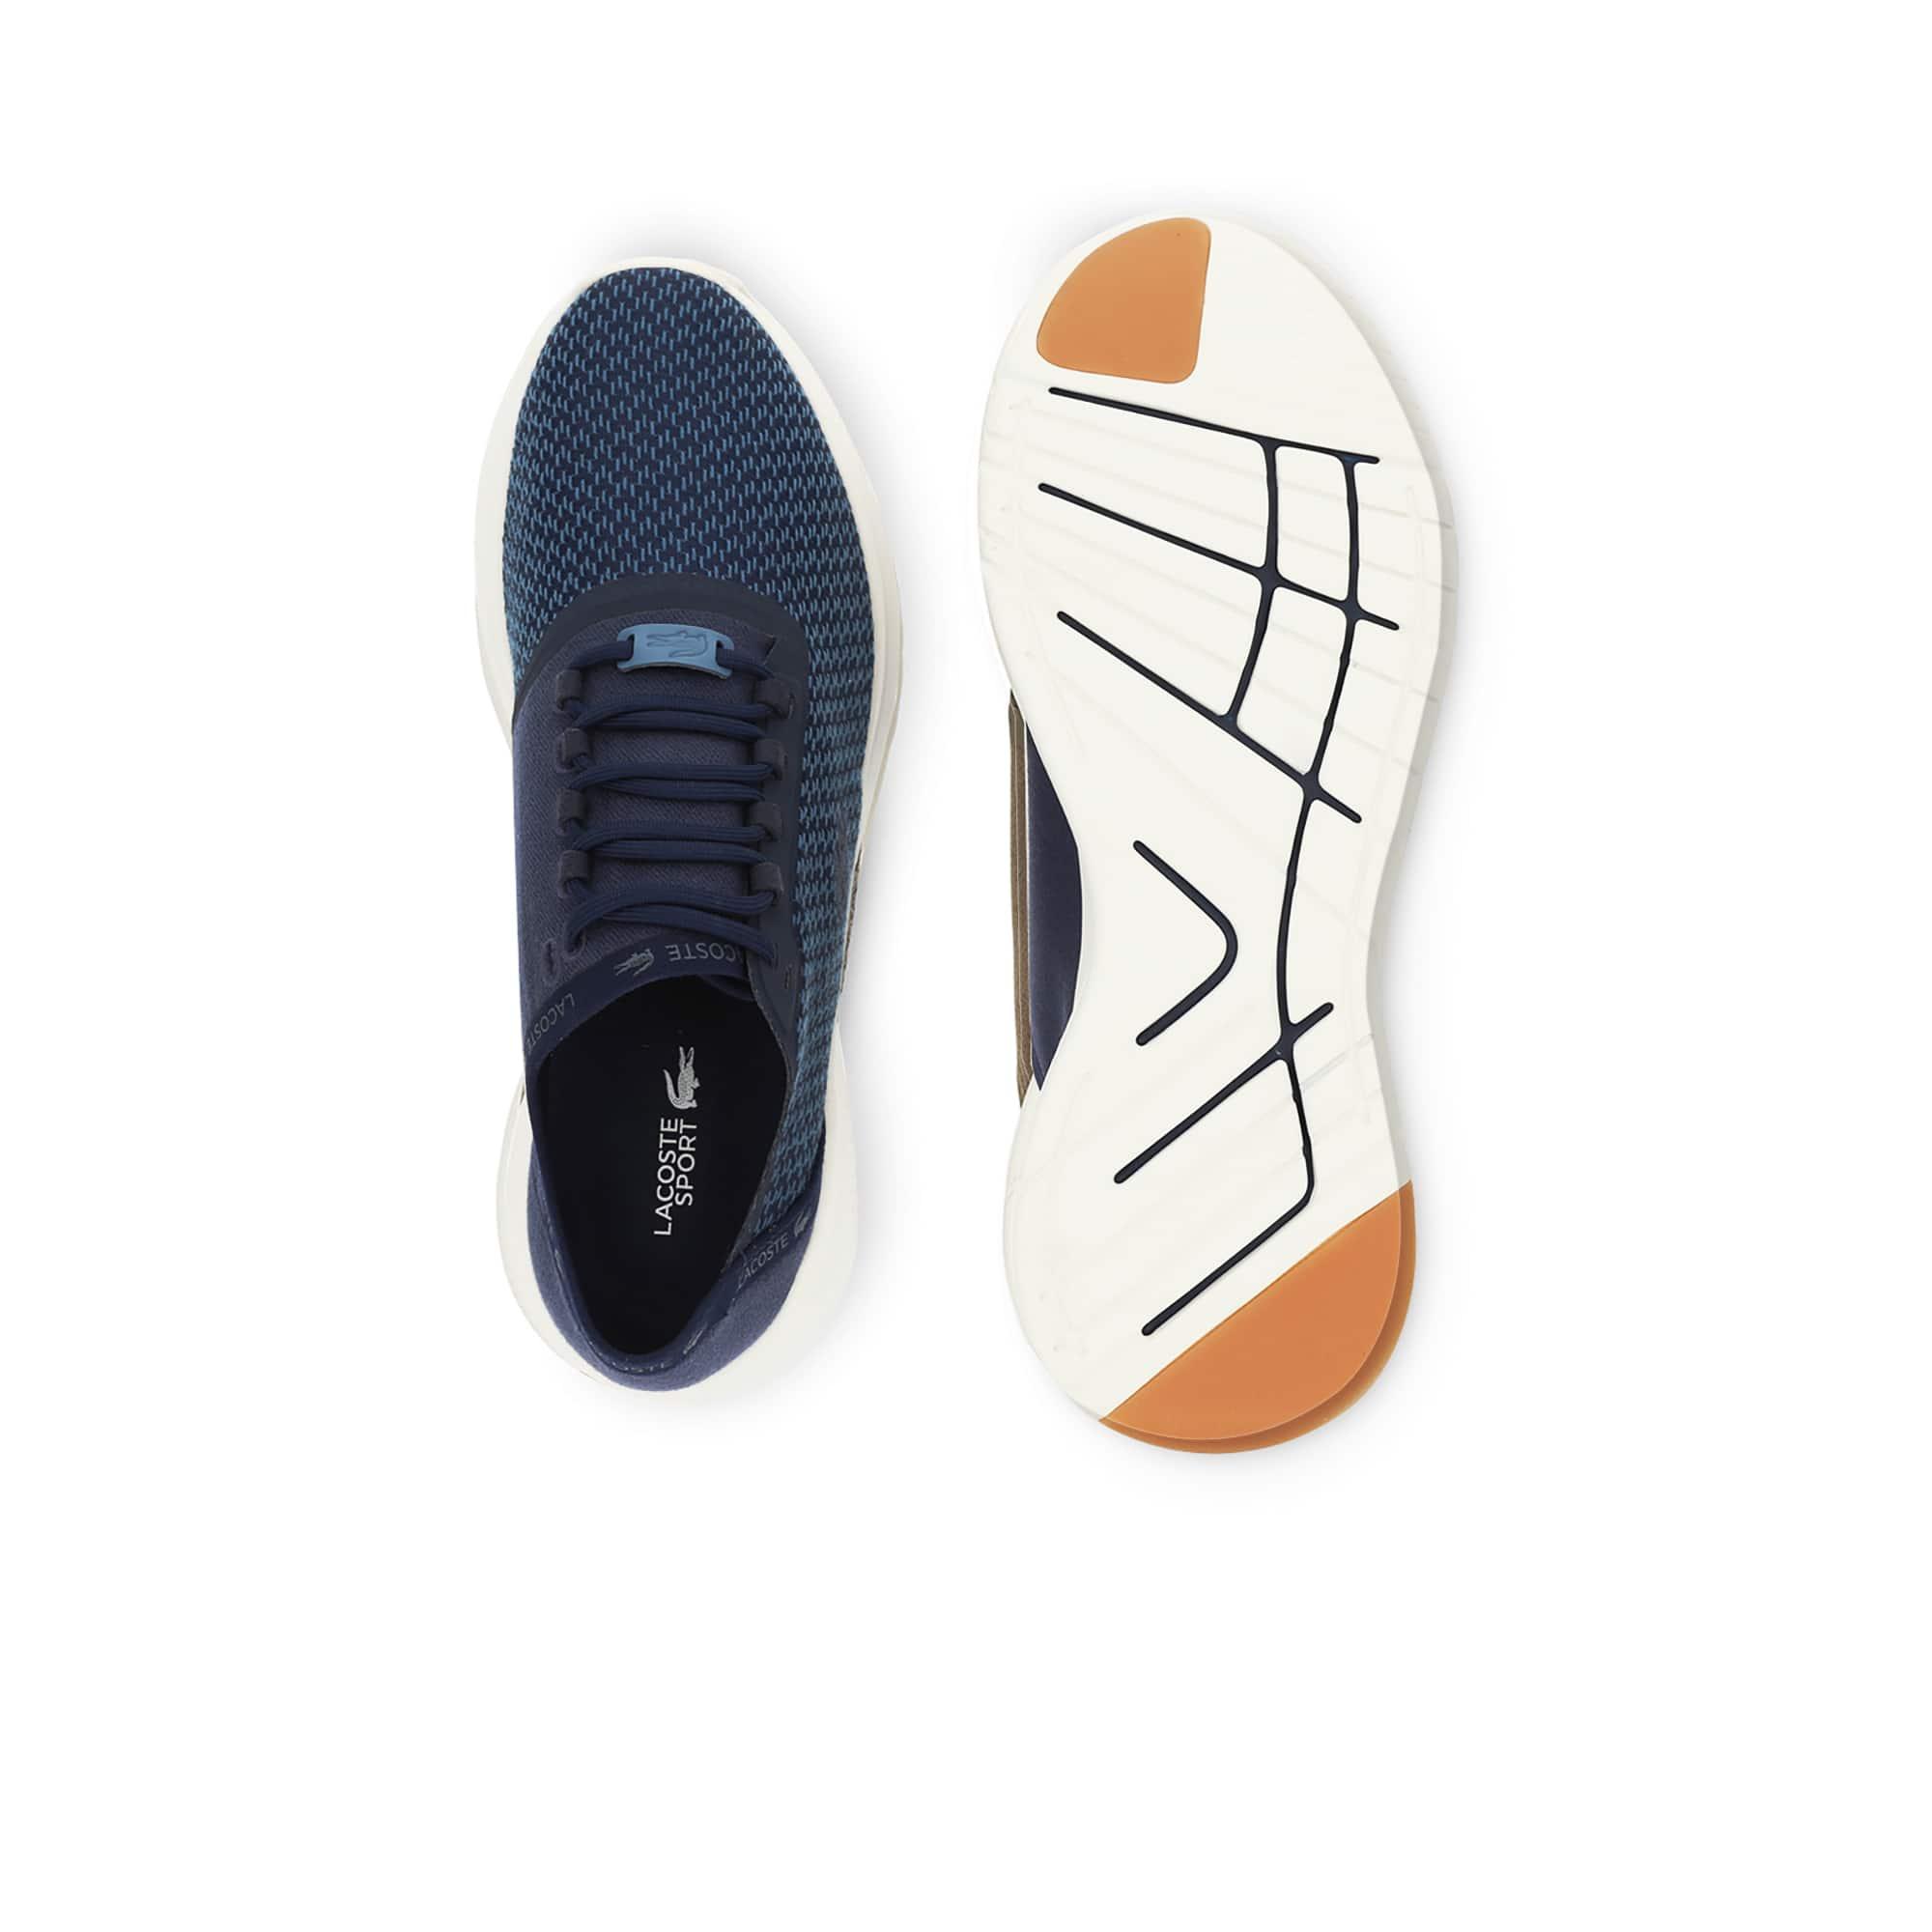 Men's LT Fit Mesh Sneakers | LACOSTE